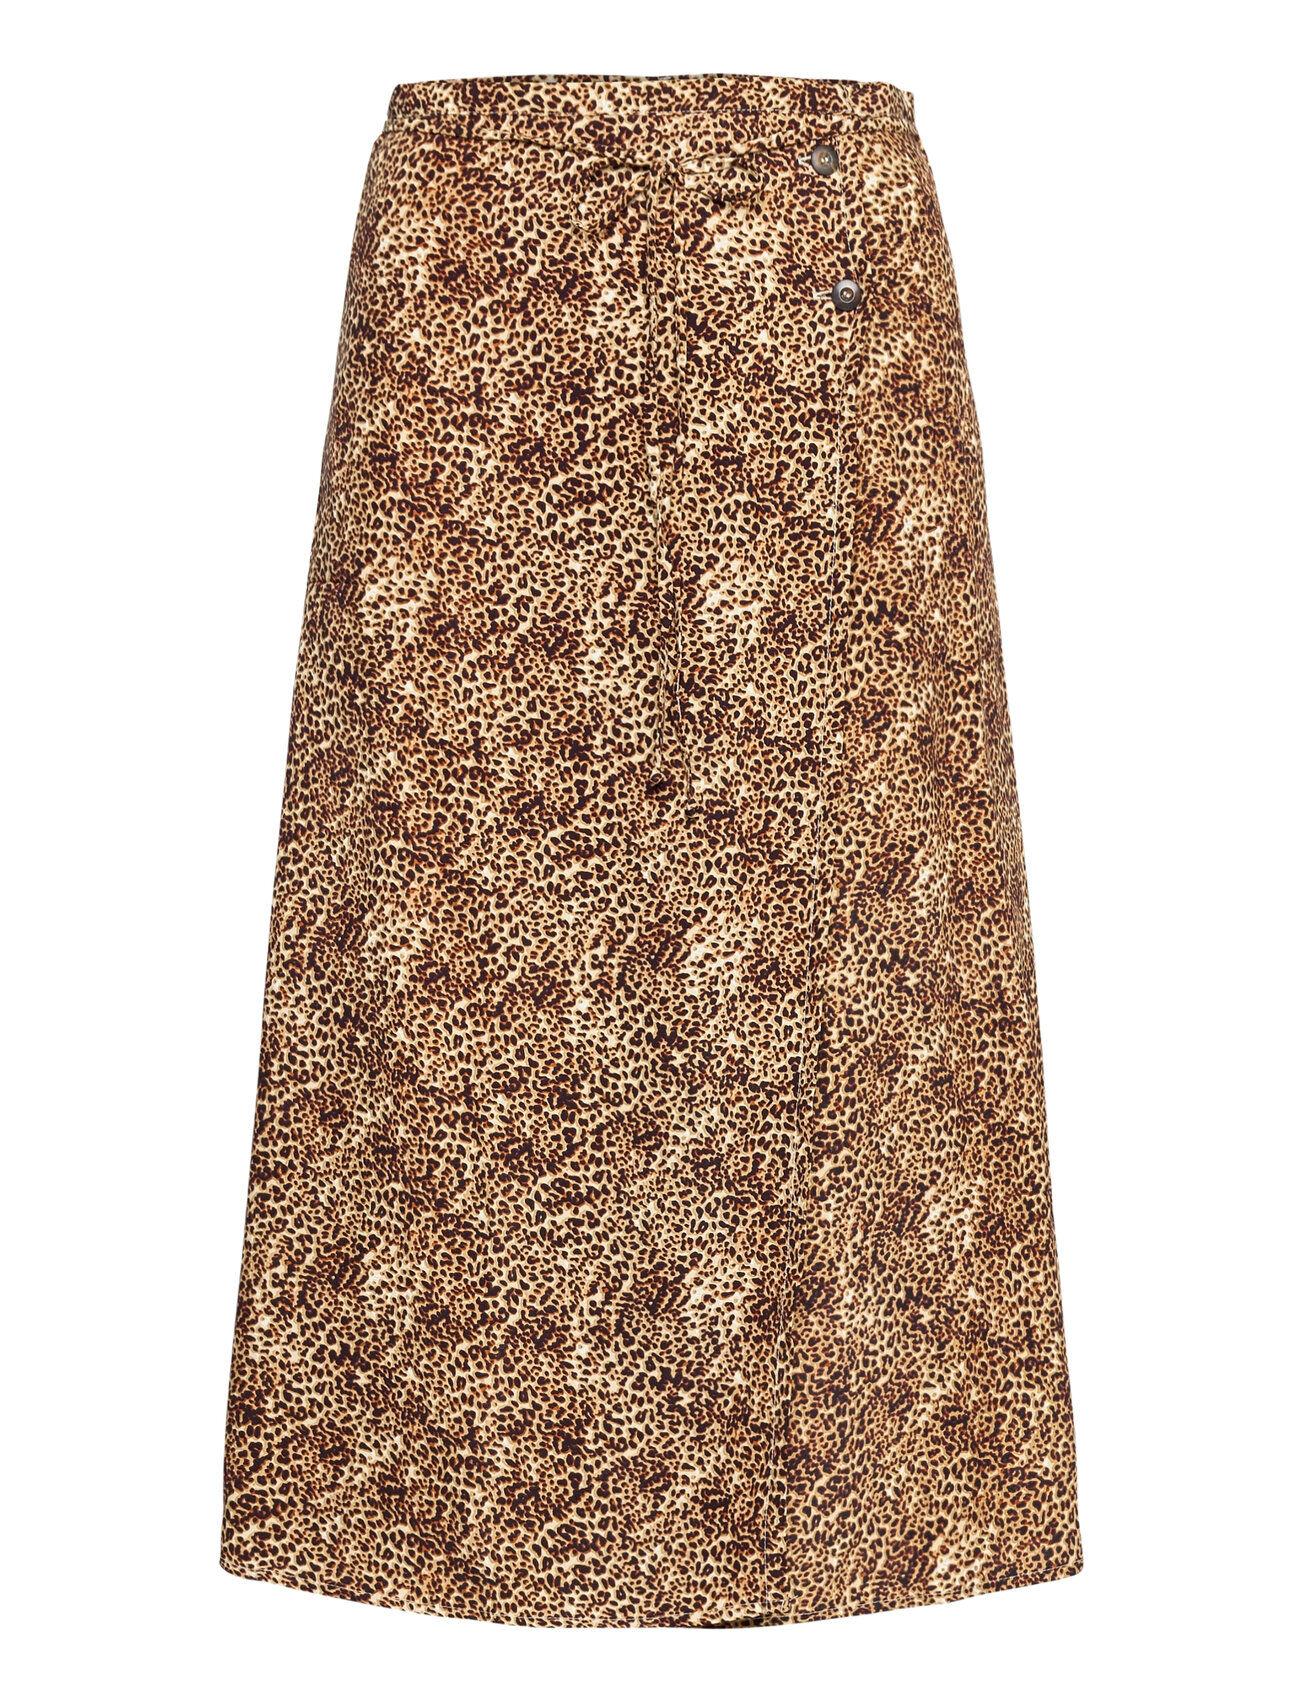 Faithfull The Brand Milana Wrap Skirt Polvipituinen Hame Ruskea Faithfull The Brand